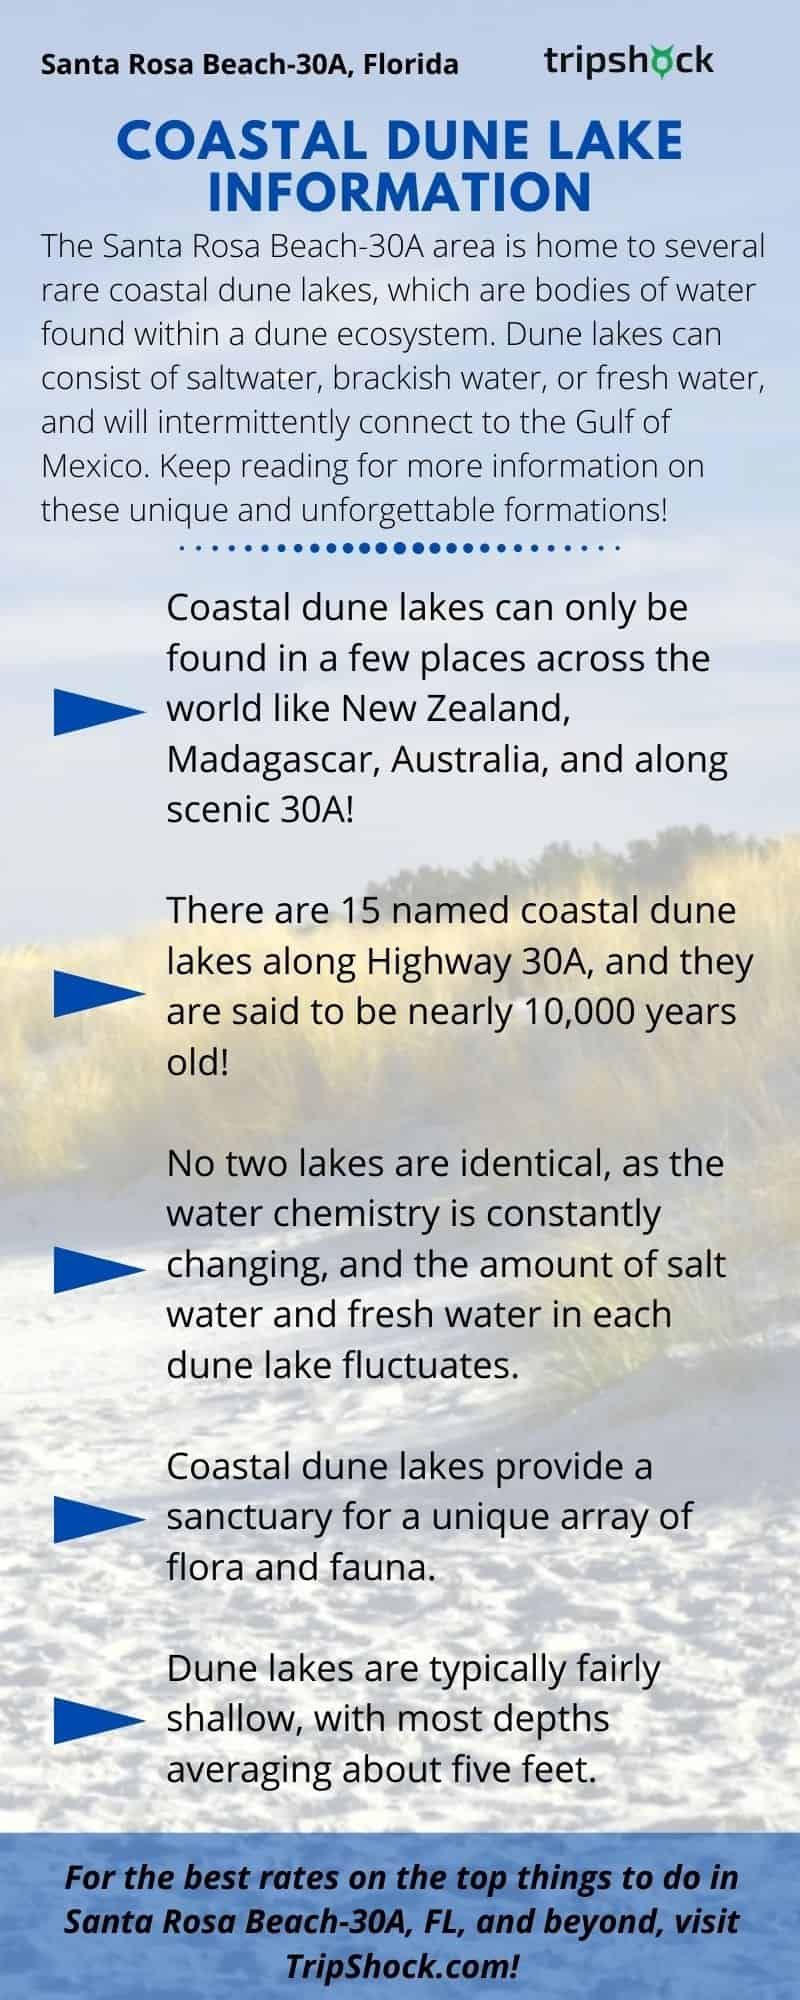 30A coastal dune lake information